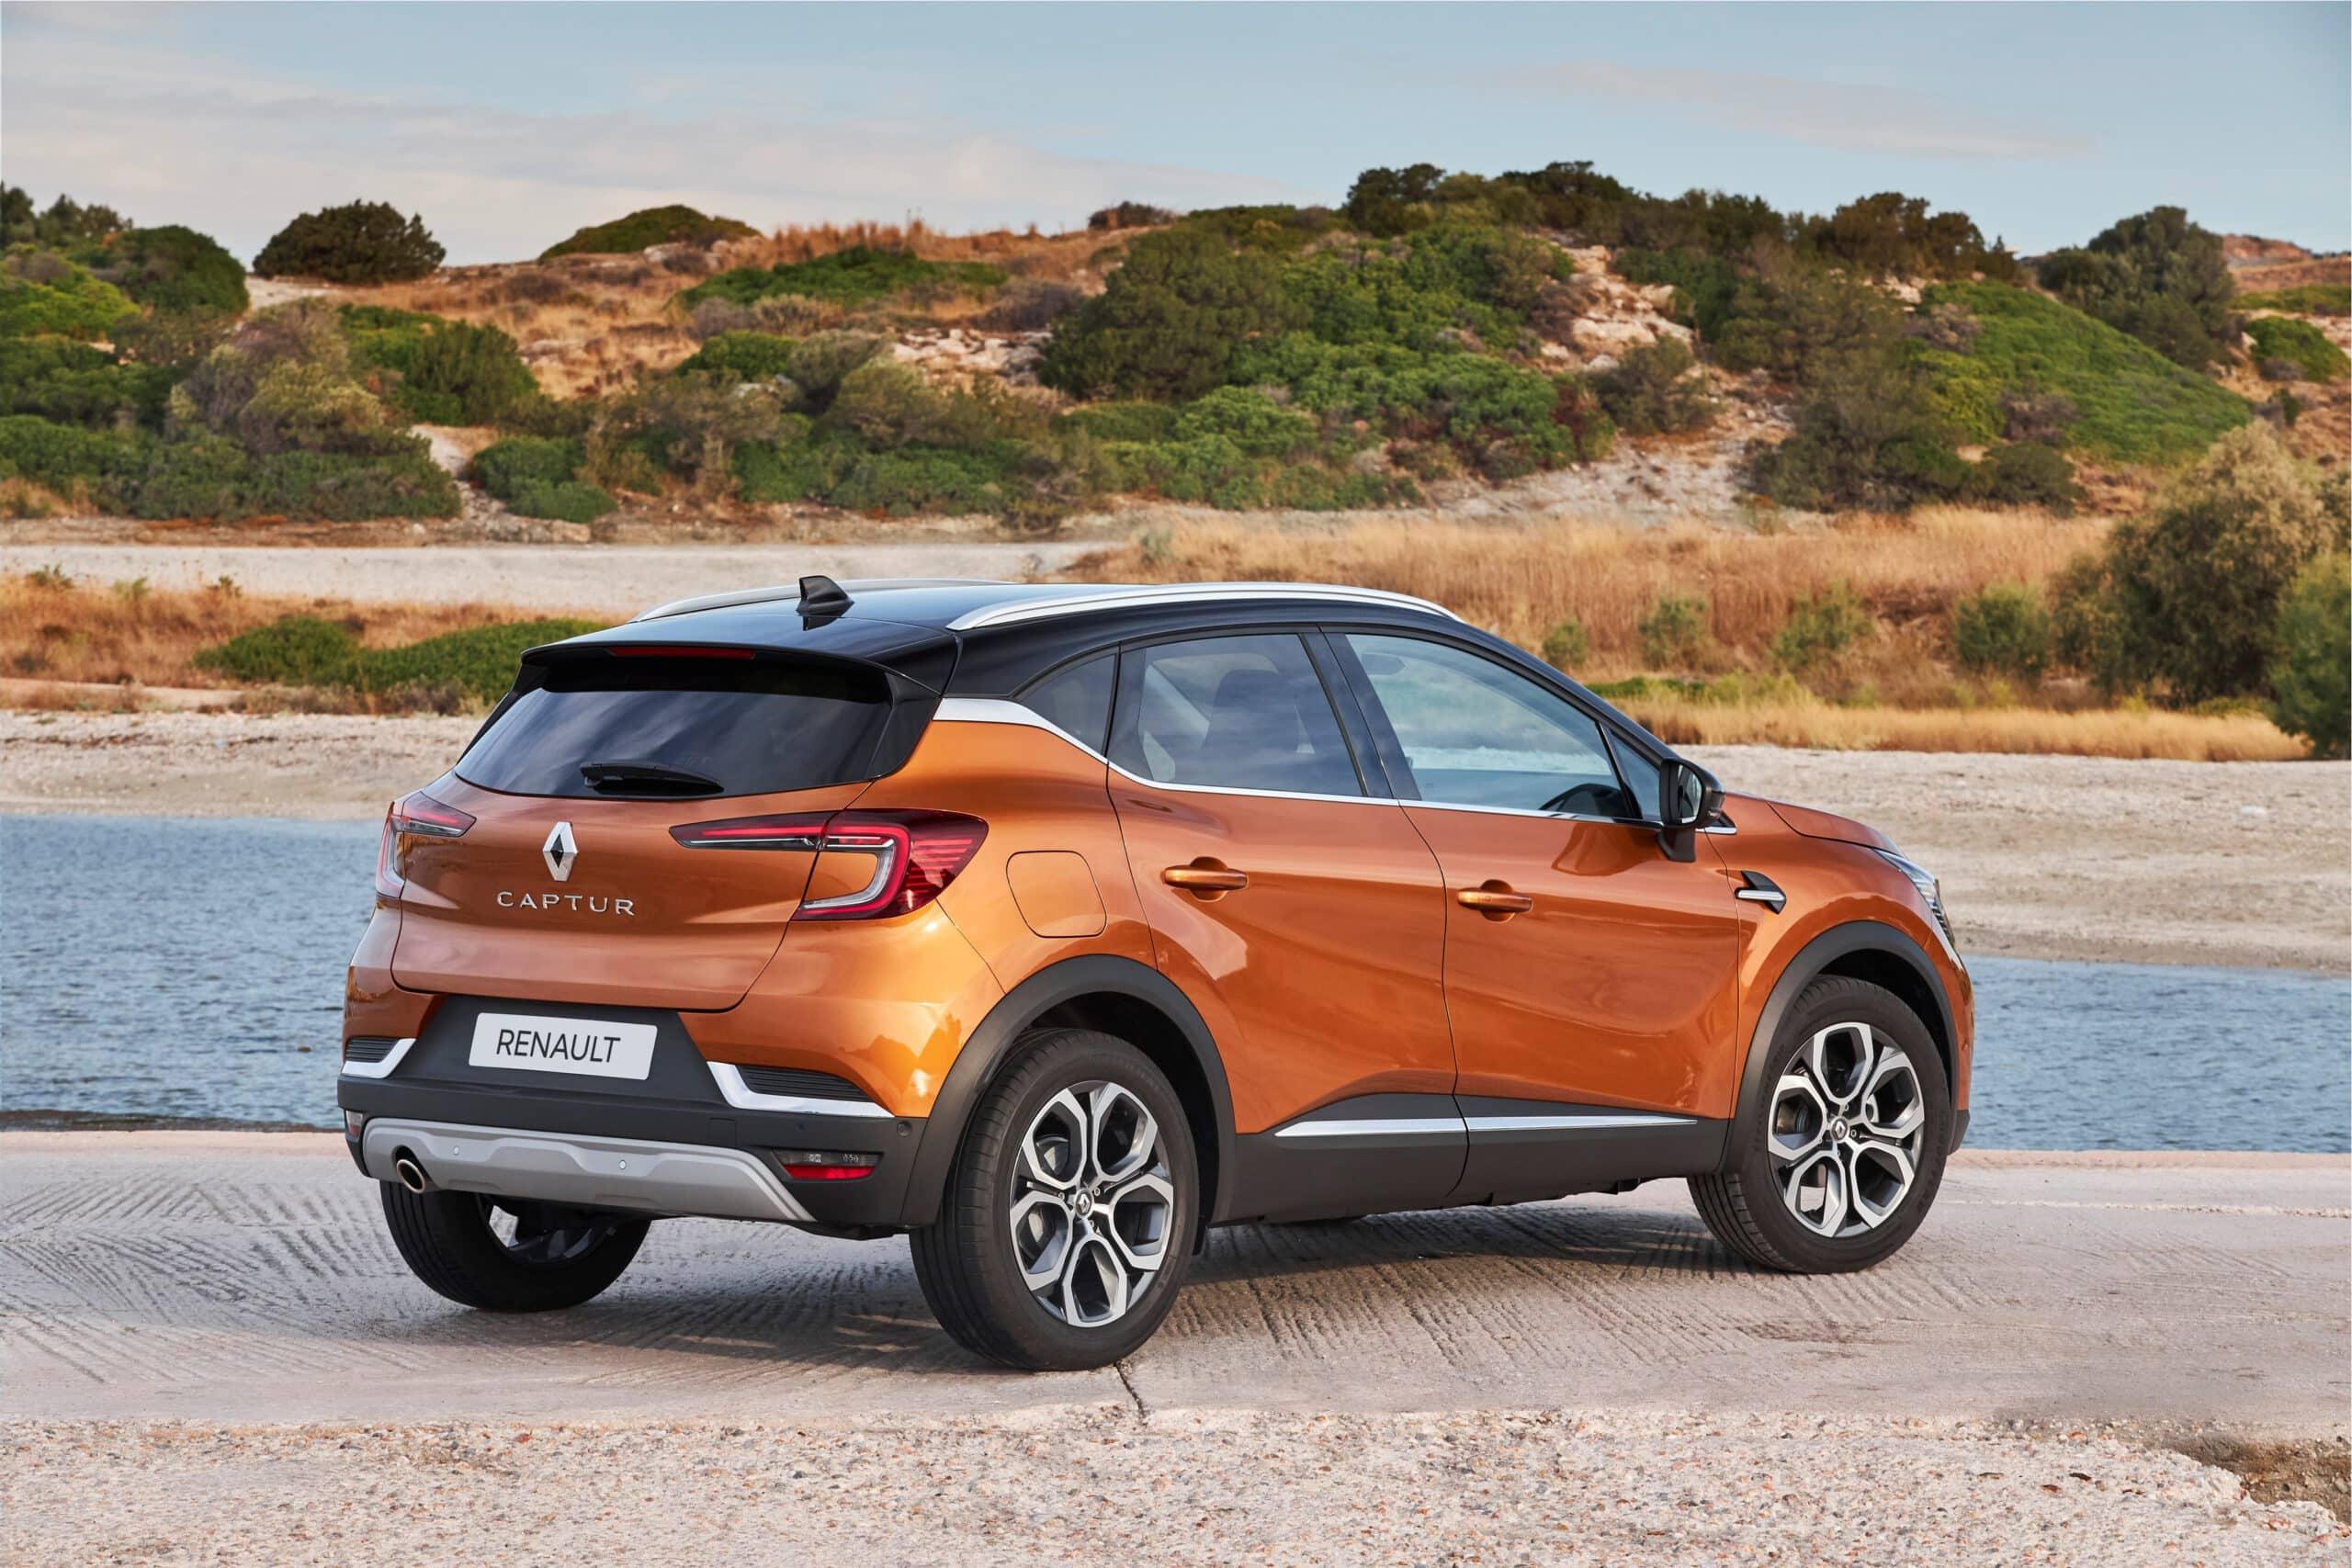 Renault Captur lntense (салон) фото 1